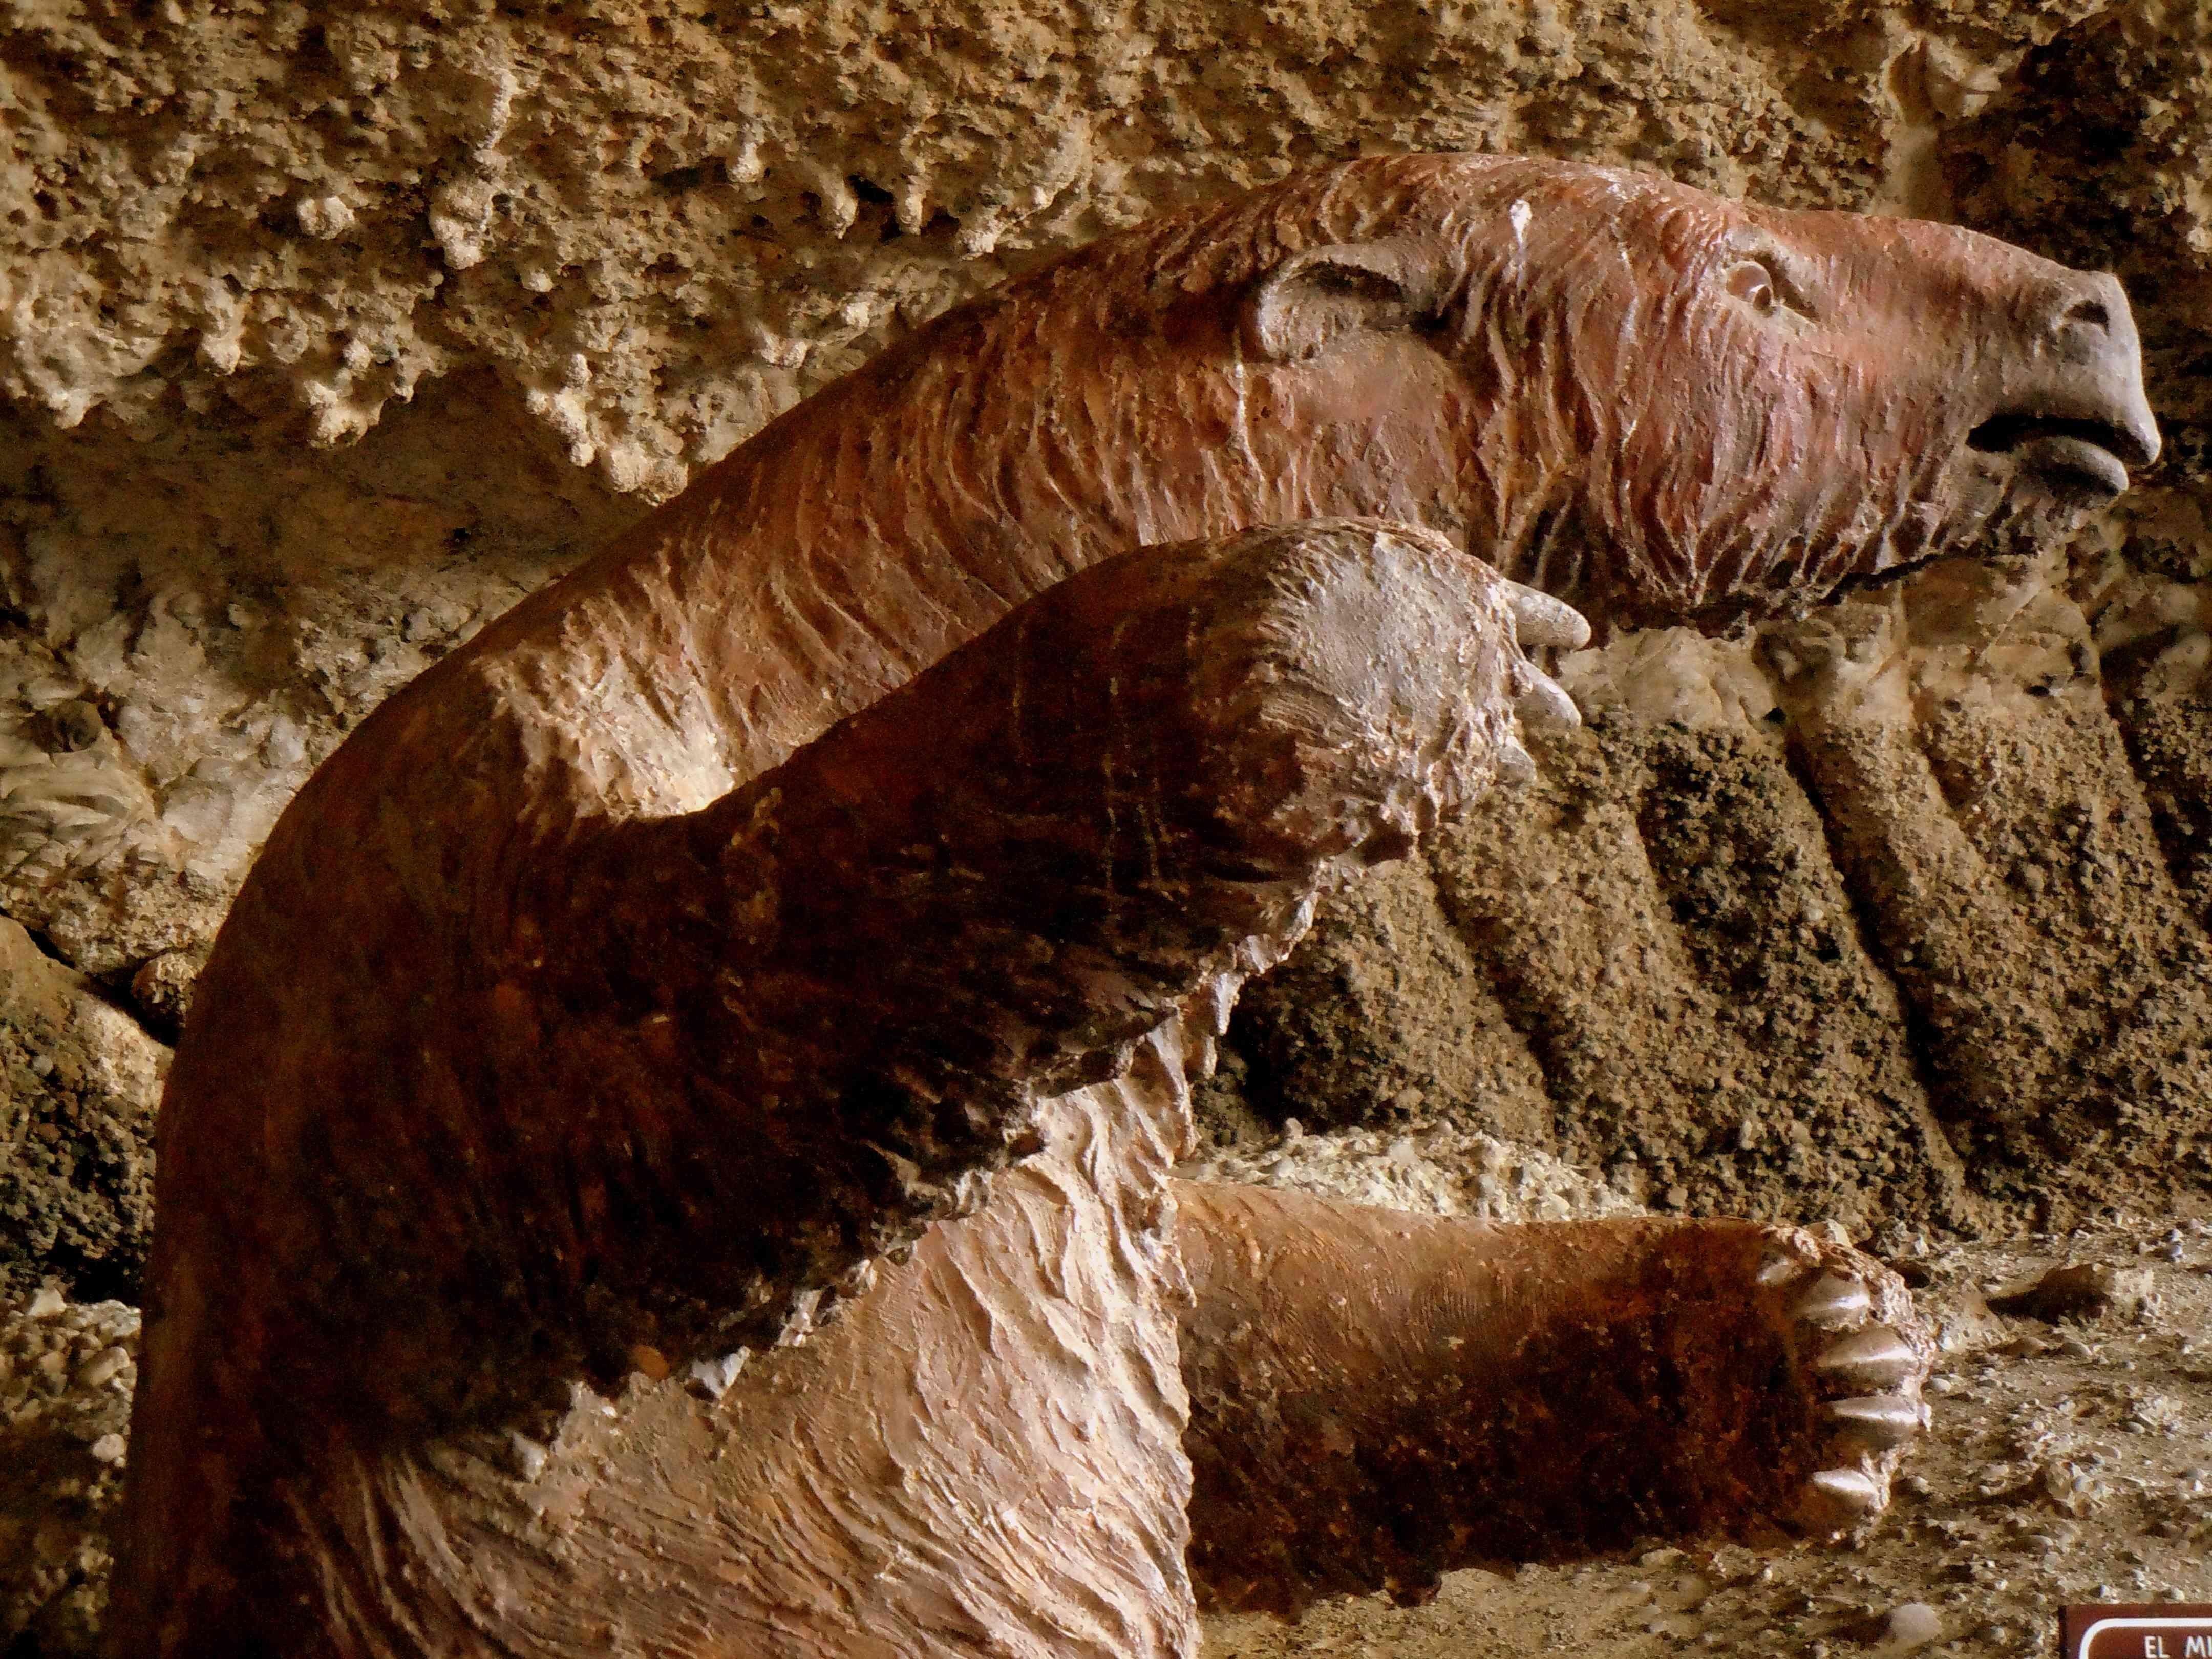 Replica of extinct Mylodon ground sloth of Patagonia